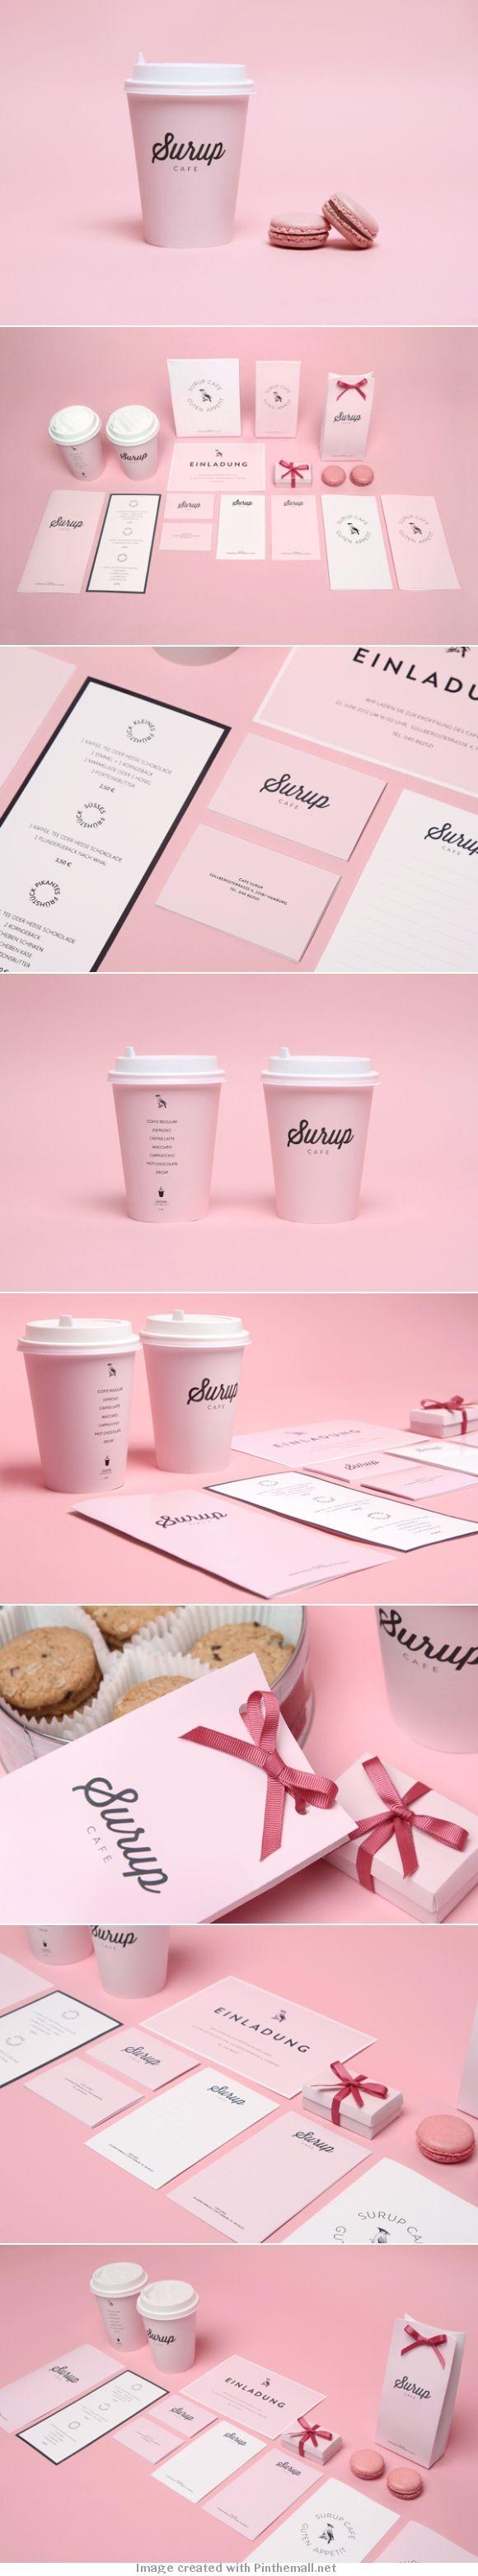 SURUP CAFE - Surup Cafe branding by Sergey Parfenov.